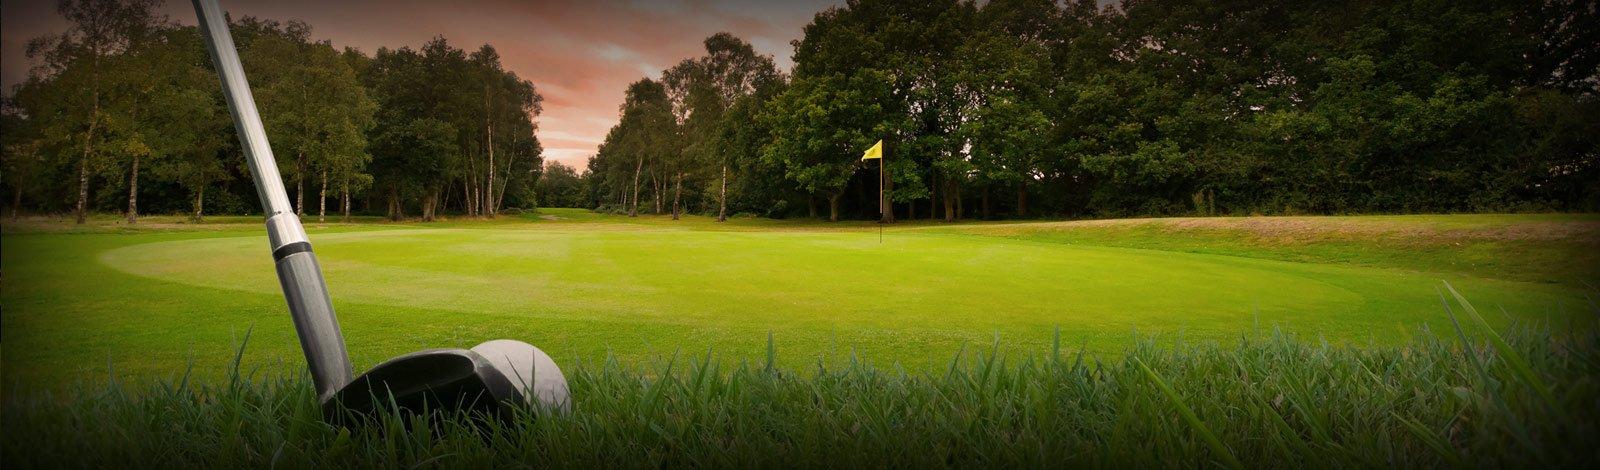 golf-banner2